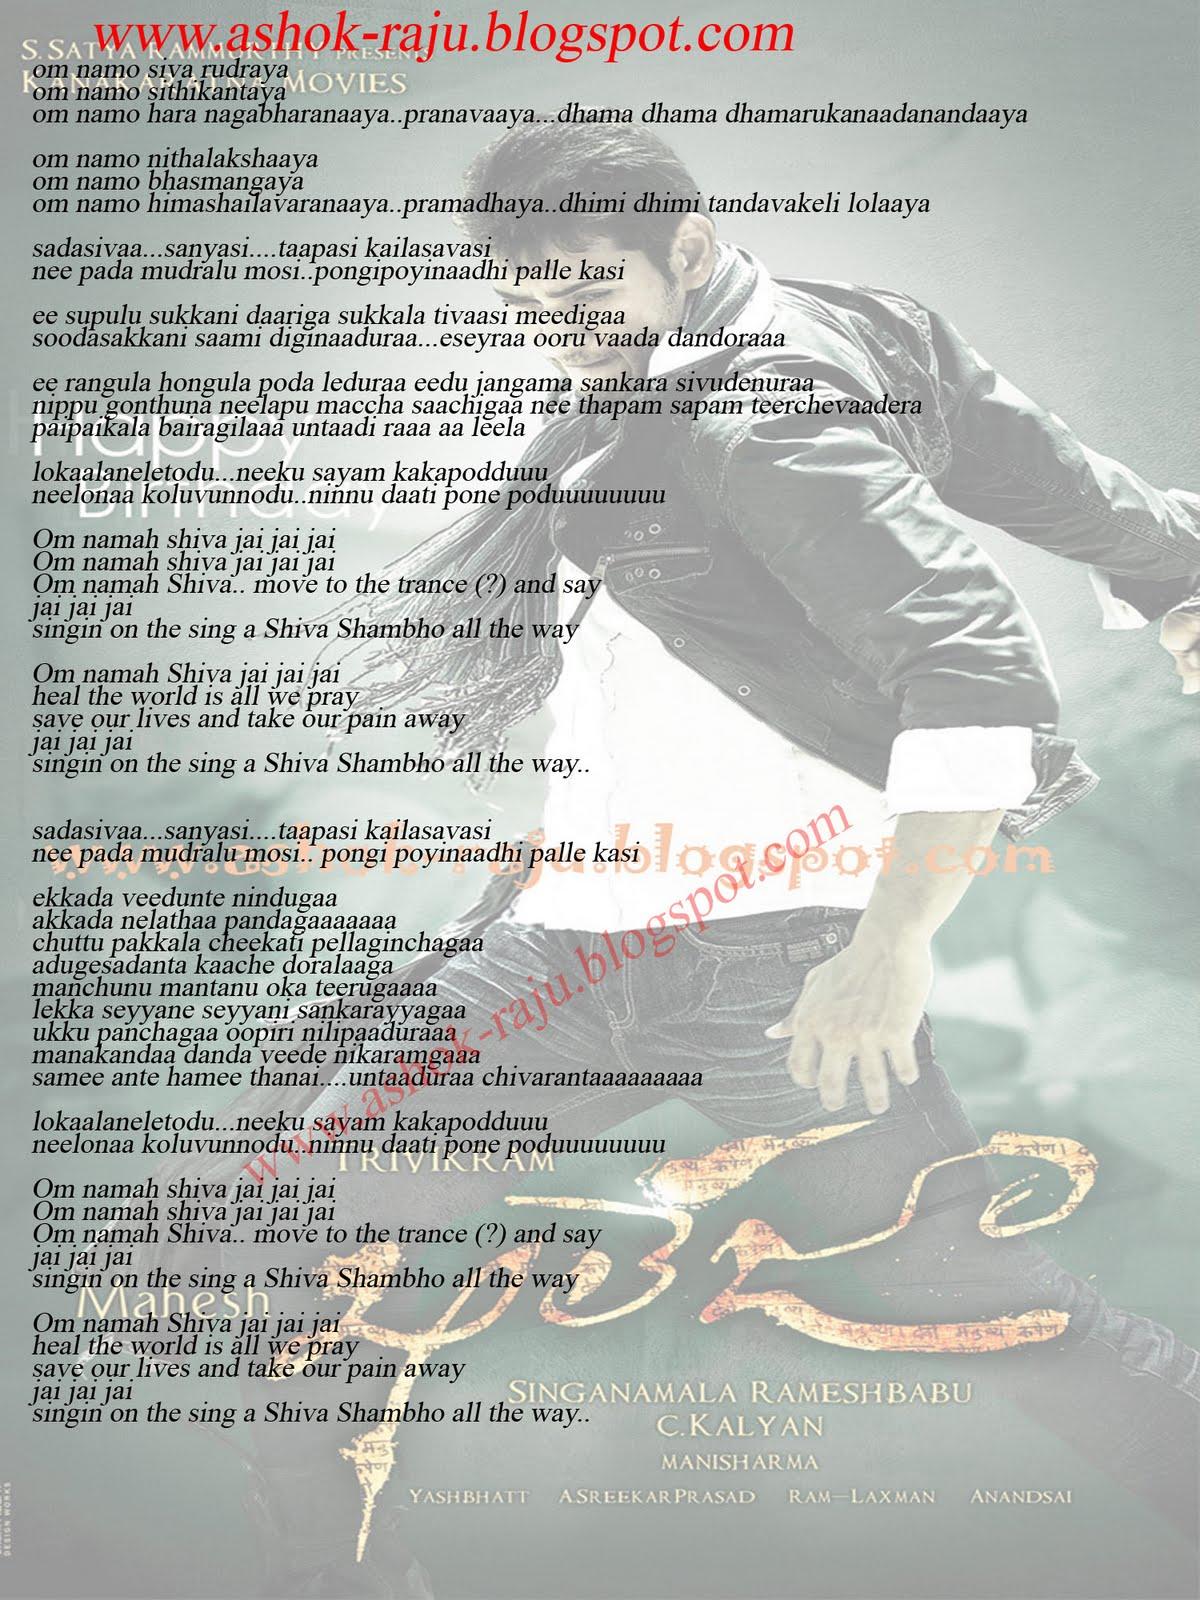 Song Lyrics Wallpaper 1200x1600